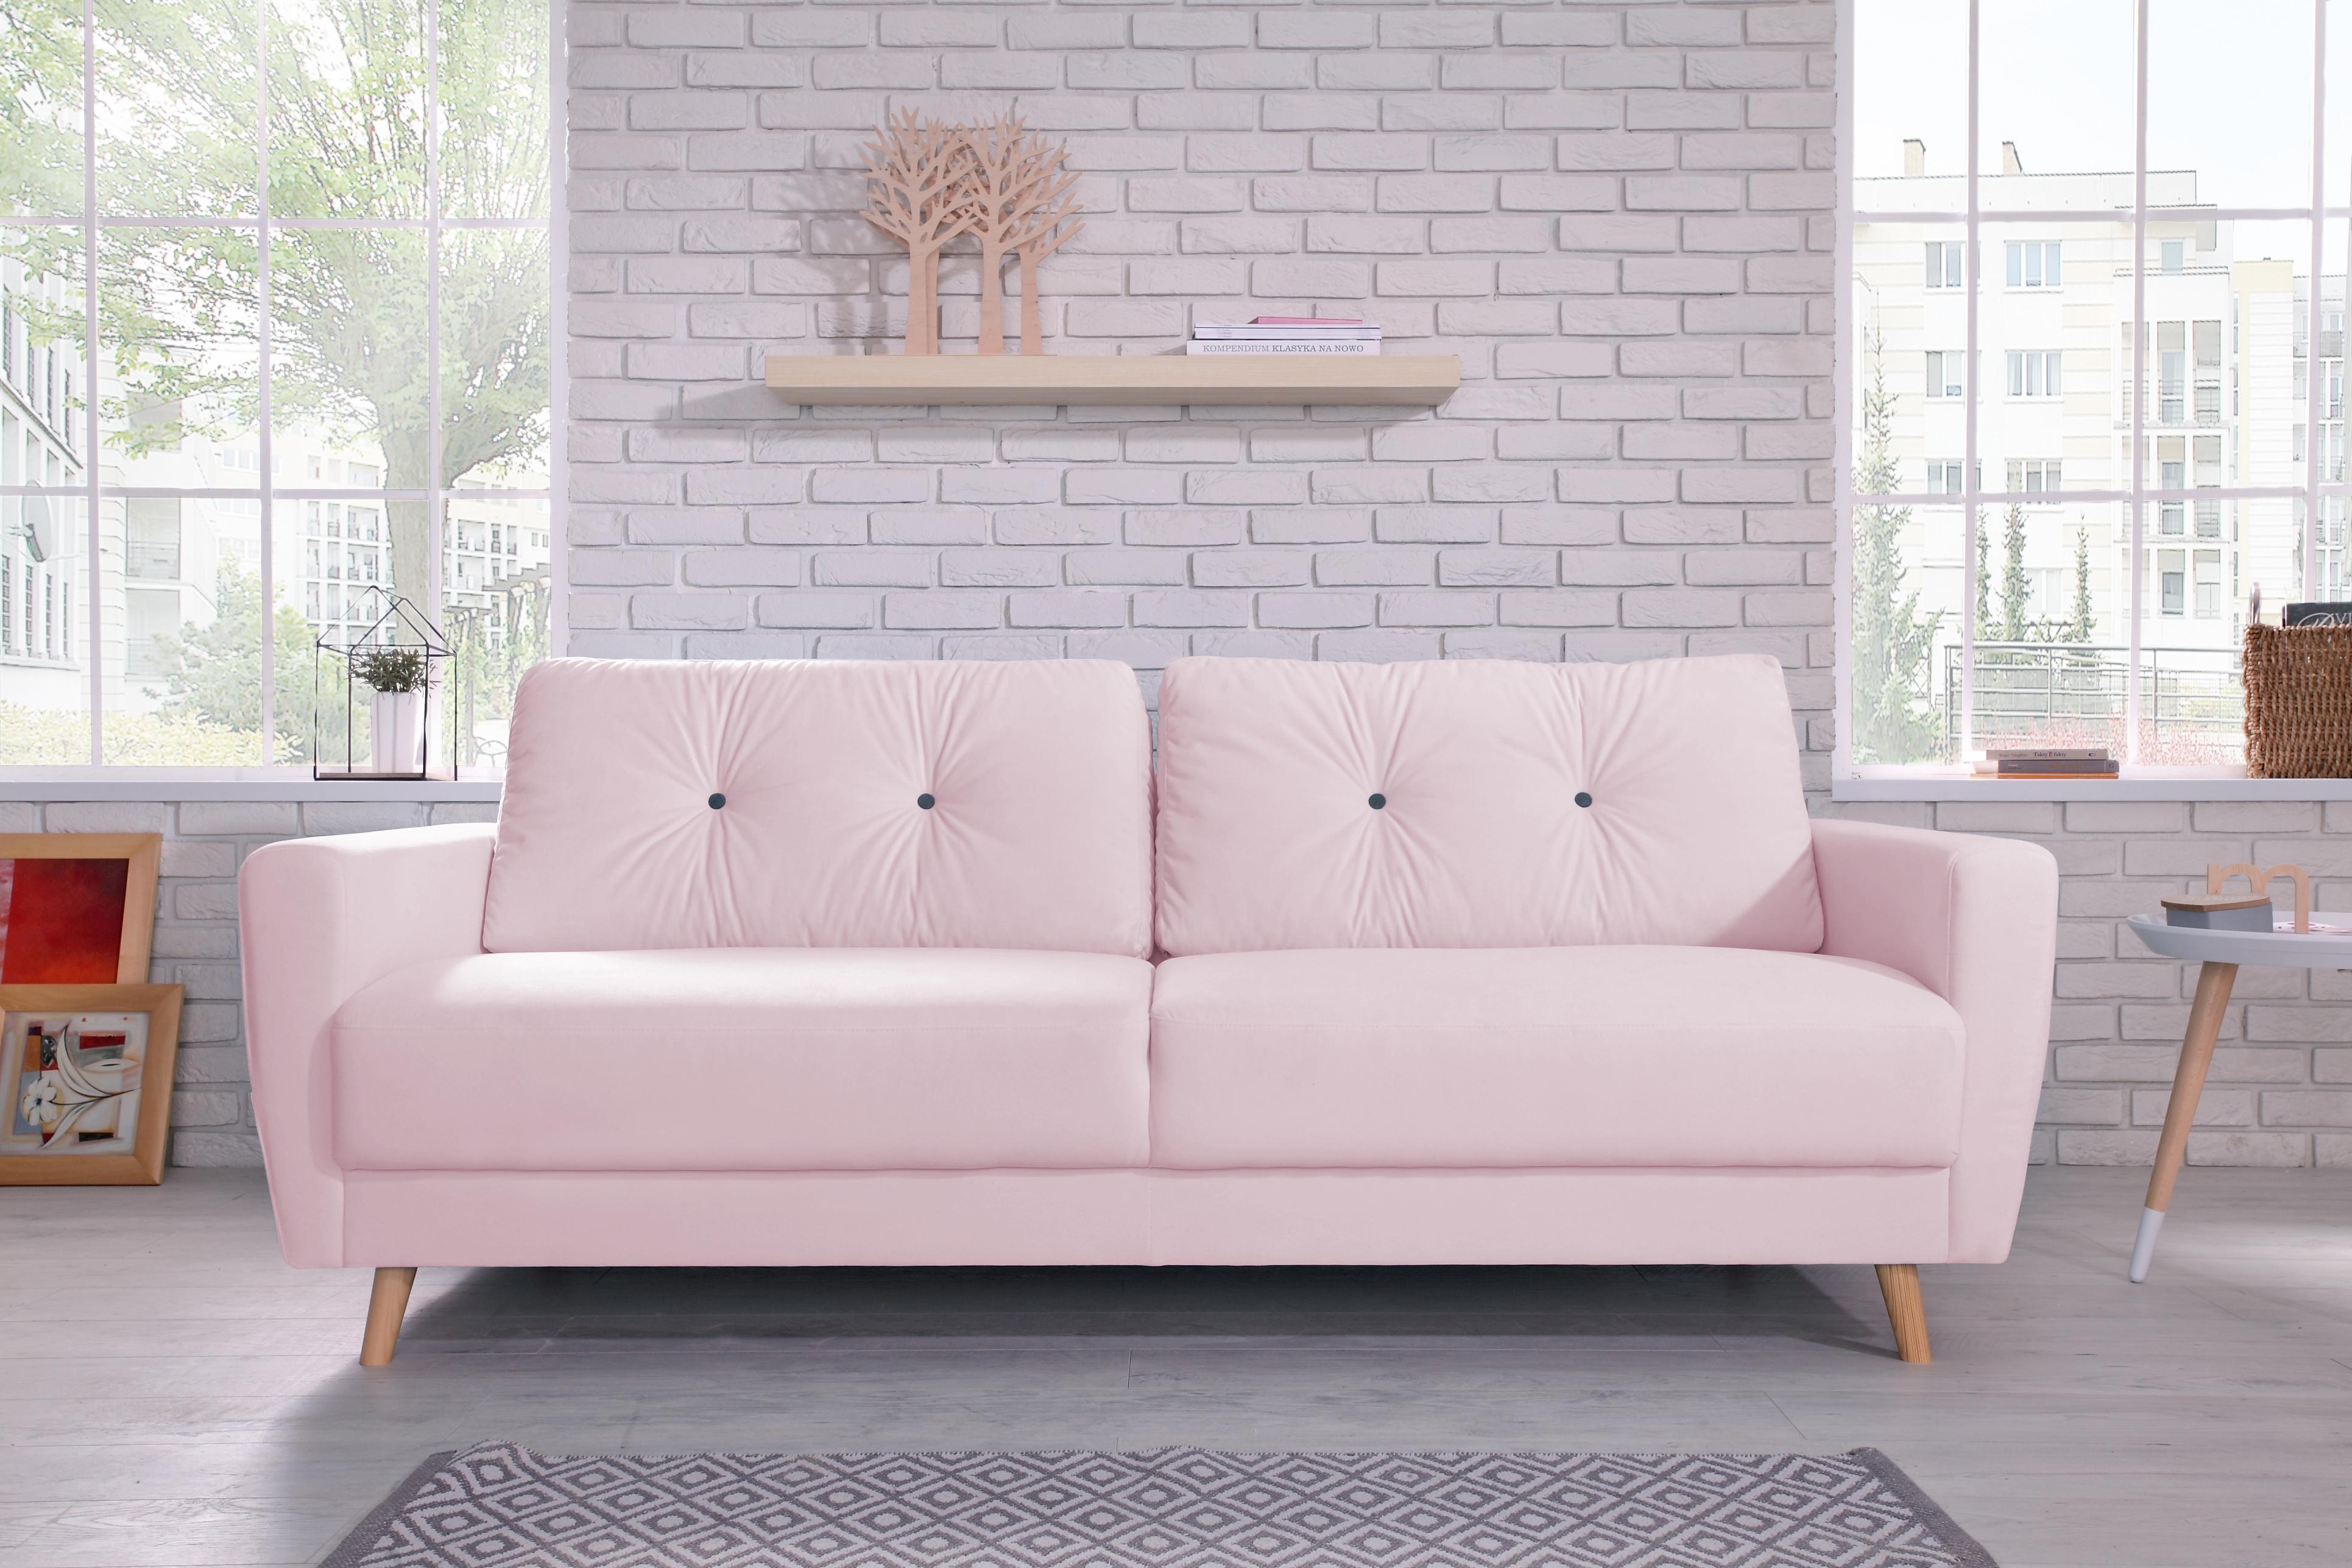 bobochic oslo canap 3 places rose poudr achat vente canap s pas chers rueducommerce. Black Bedroom Furniture Sets. Home Design Ideas